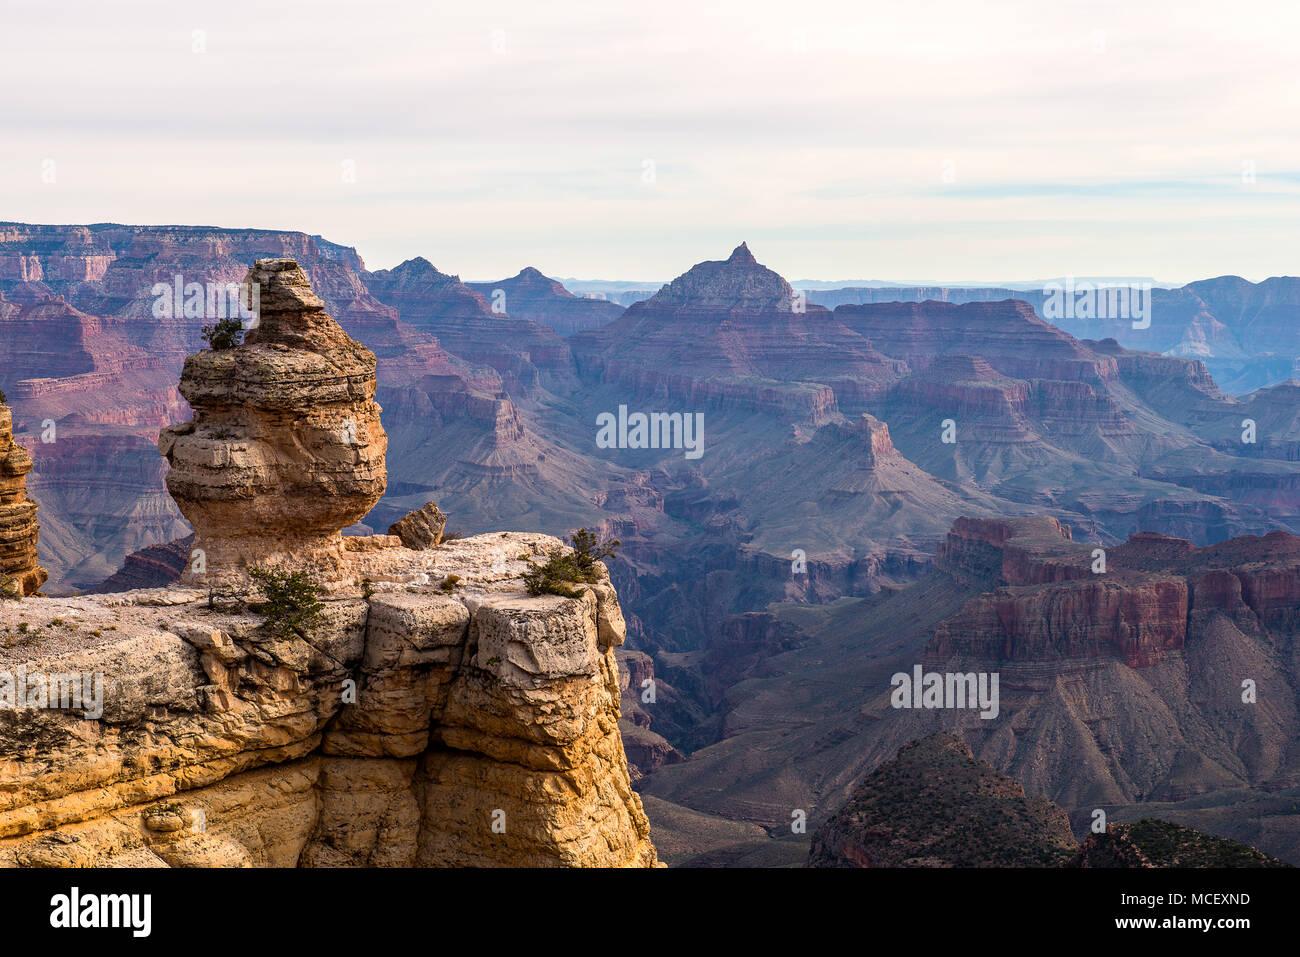 The Grand Canyon National Park, Arizona USA - Stock Image